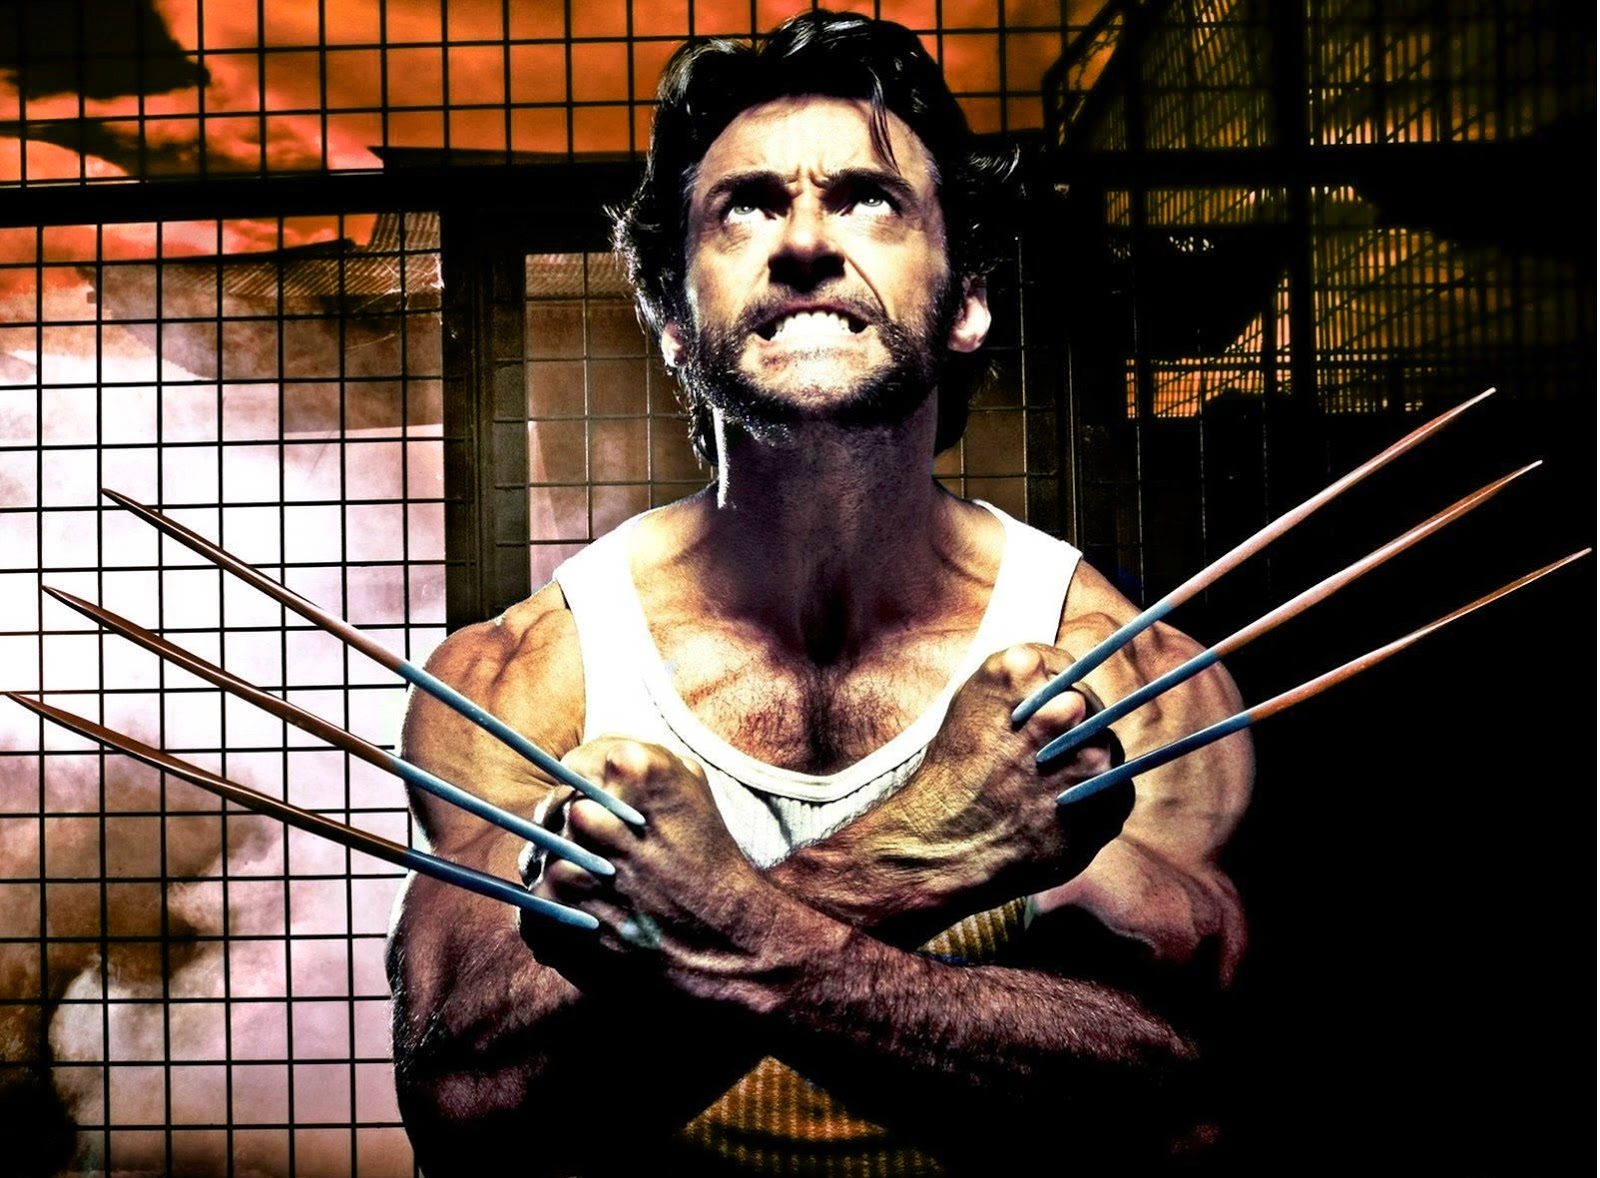 Hollywood Stars Hugh Jackman Wolverine Movie New Hd Wallpaper 2013